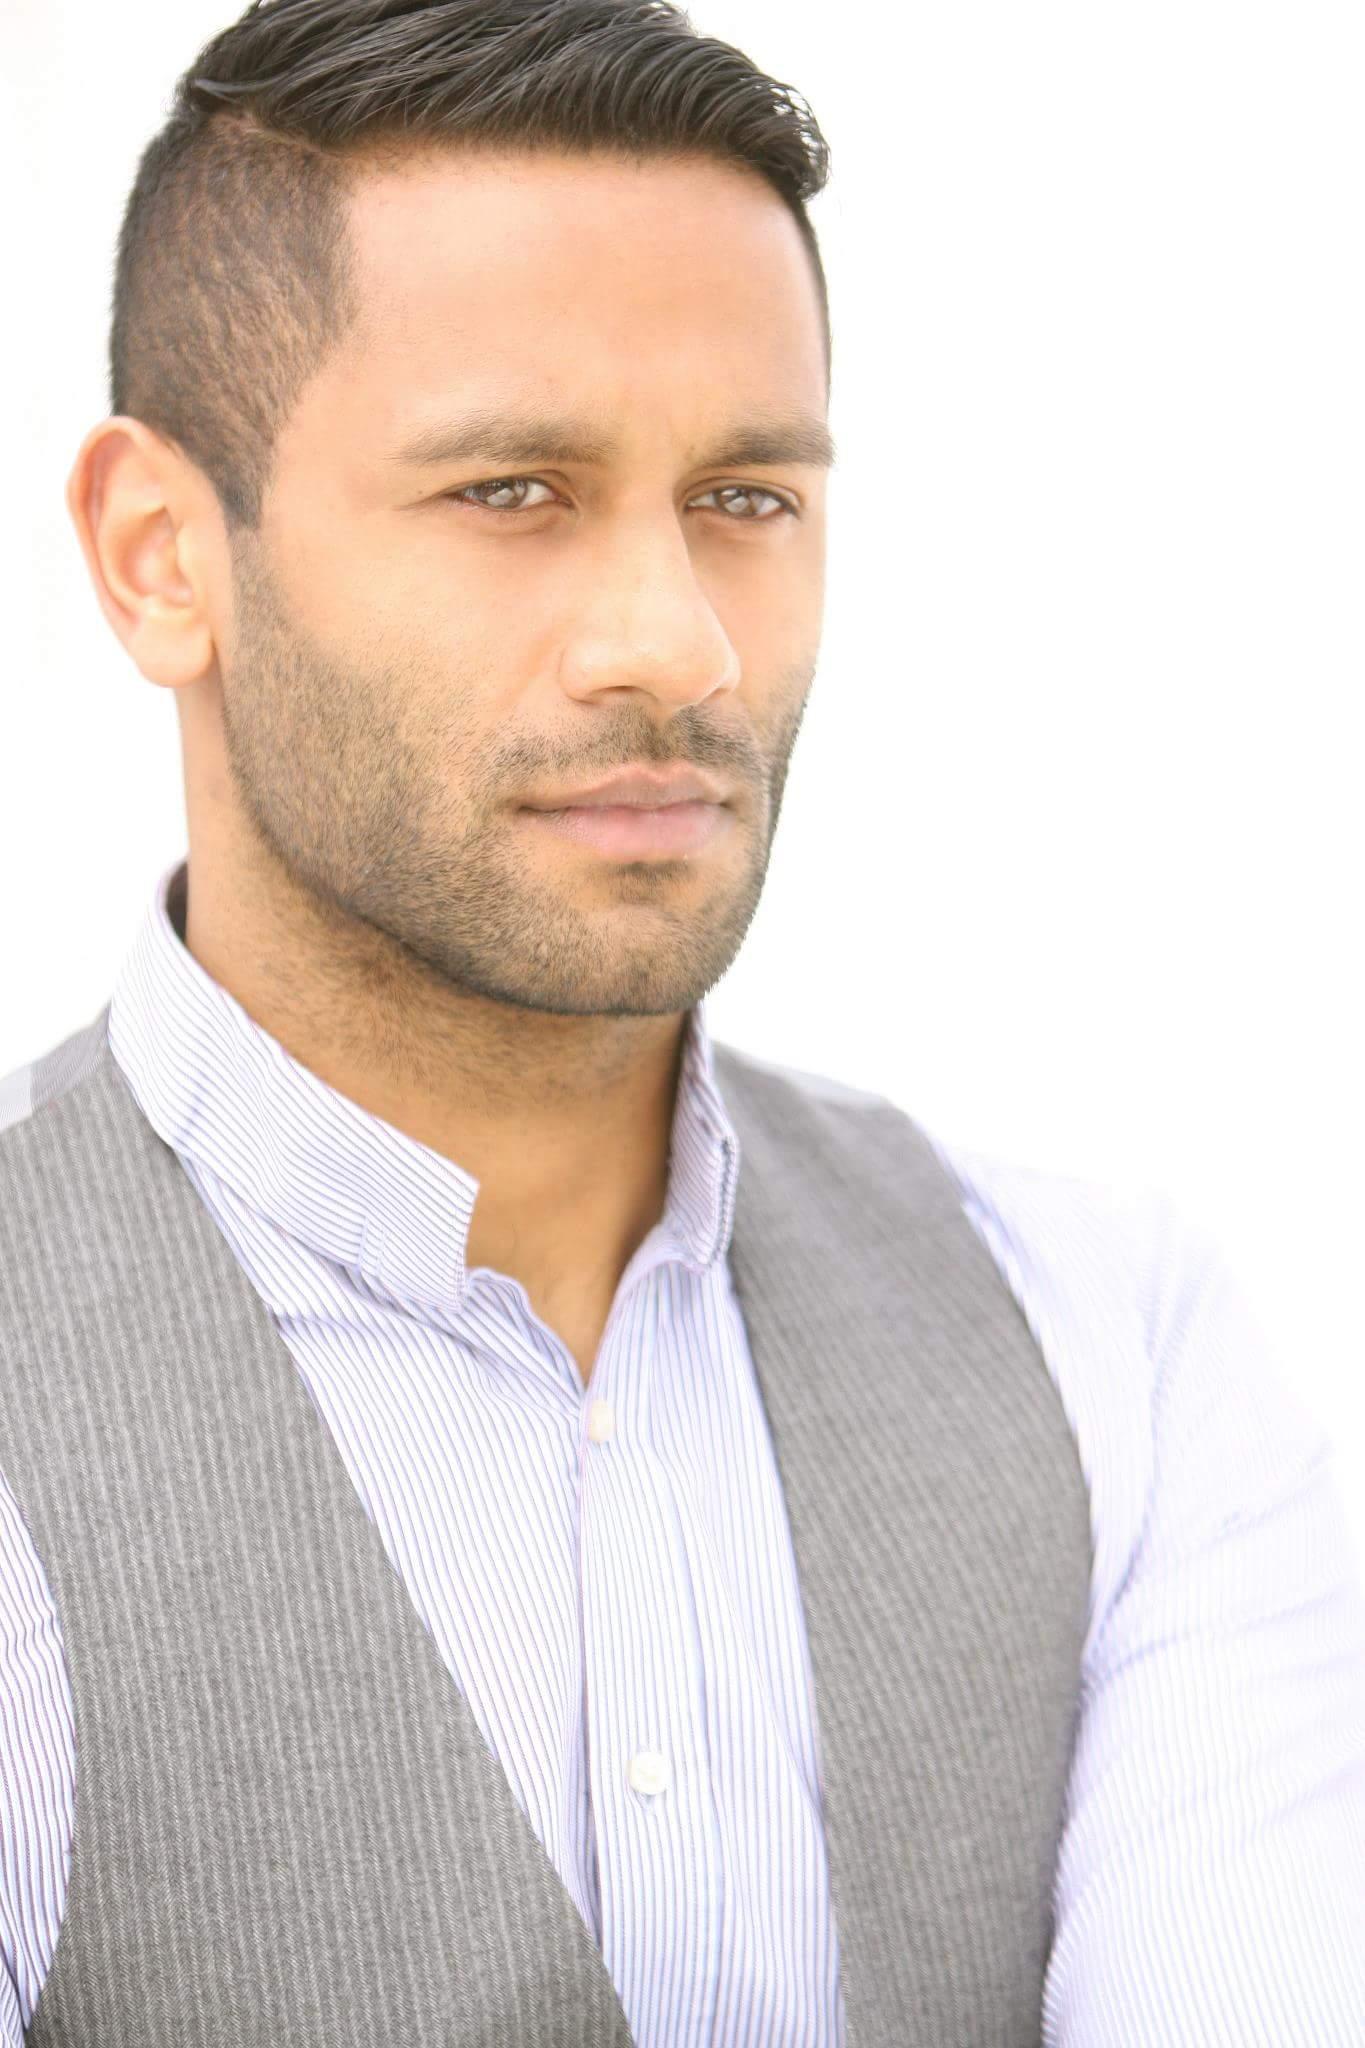 Benjamin L Profile